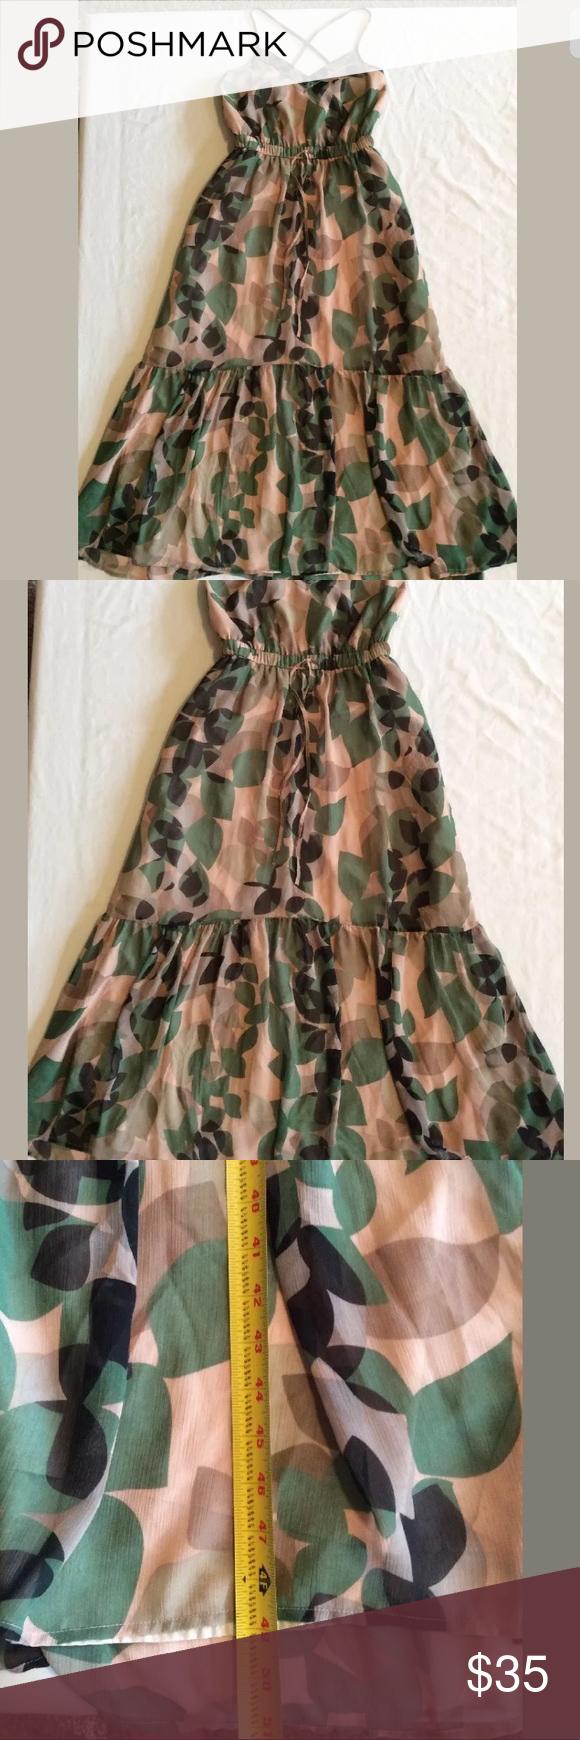 Gap Maxi Dress Camouflage Gap Women S Size Xs Army Green Tan Beige Camouflage Long Maxi Dress Spaghetti Straps Empire Gap Maxi Dress Gap Dress Maxi Dress [ 1740 x 580 Pixel ]